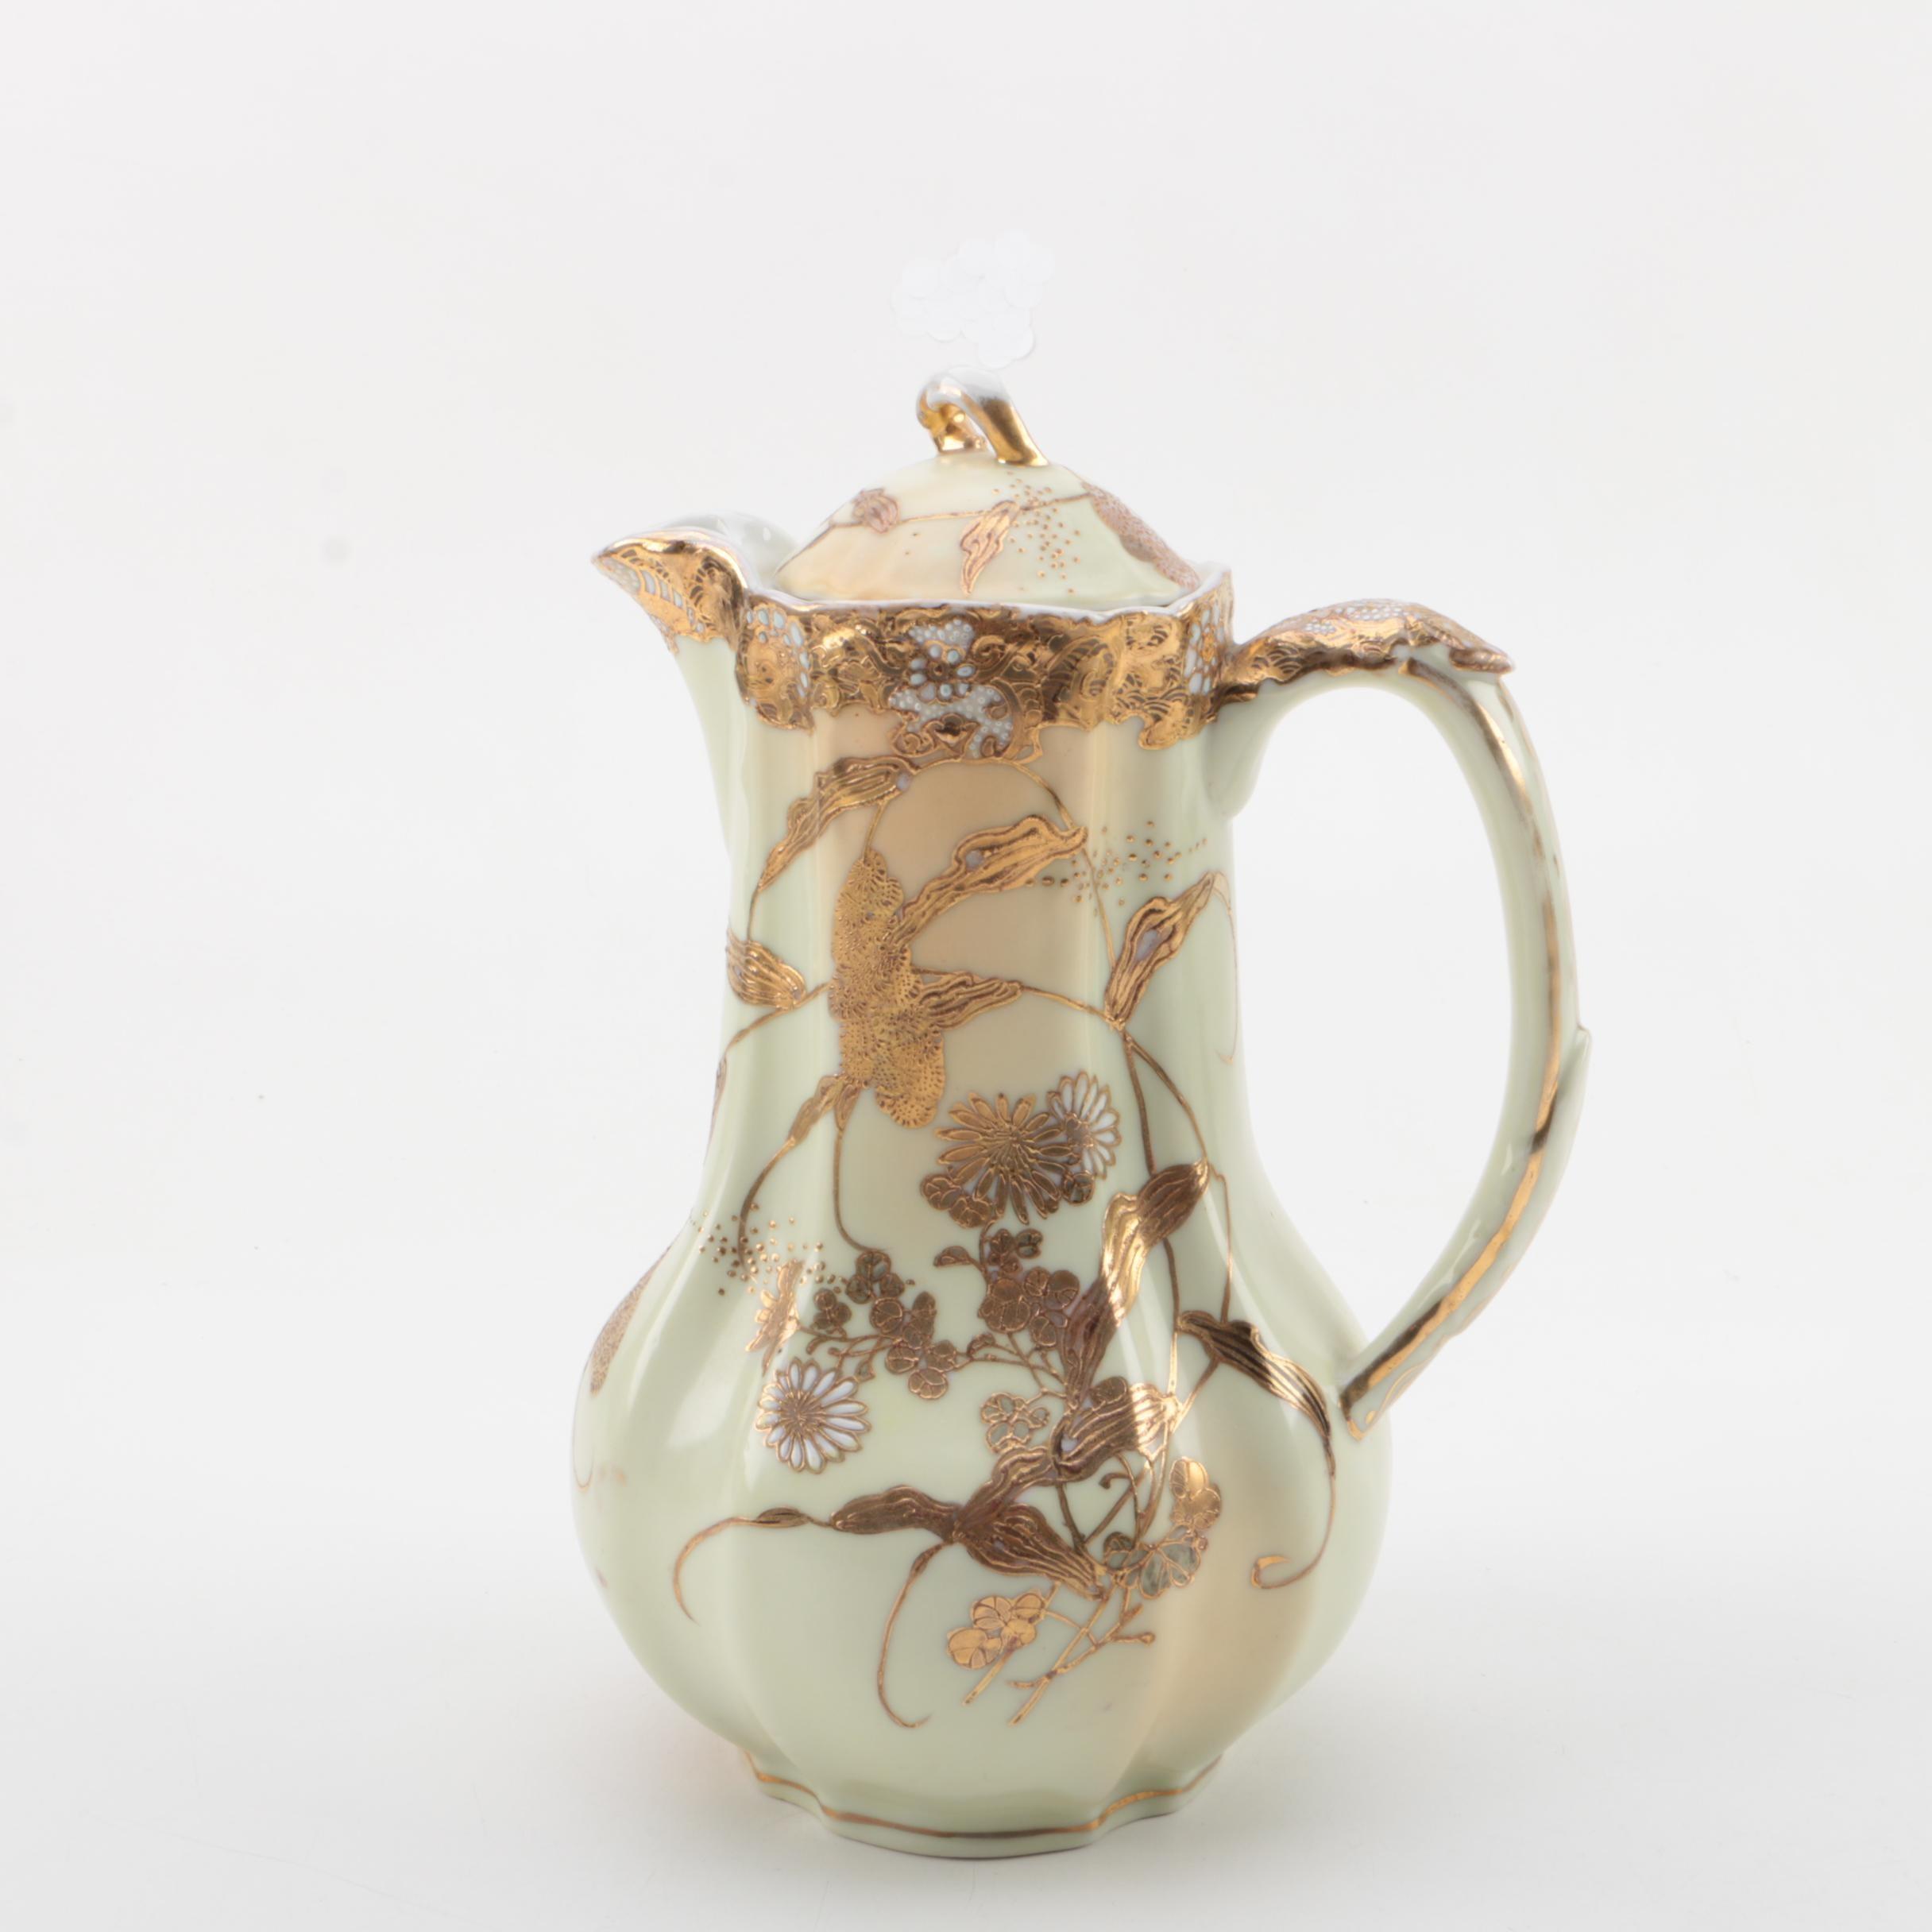 Vintage Japanese Gilt Porcelain Teapot